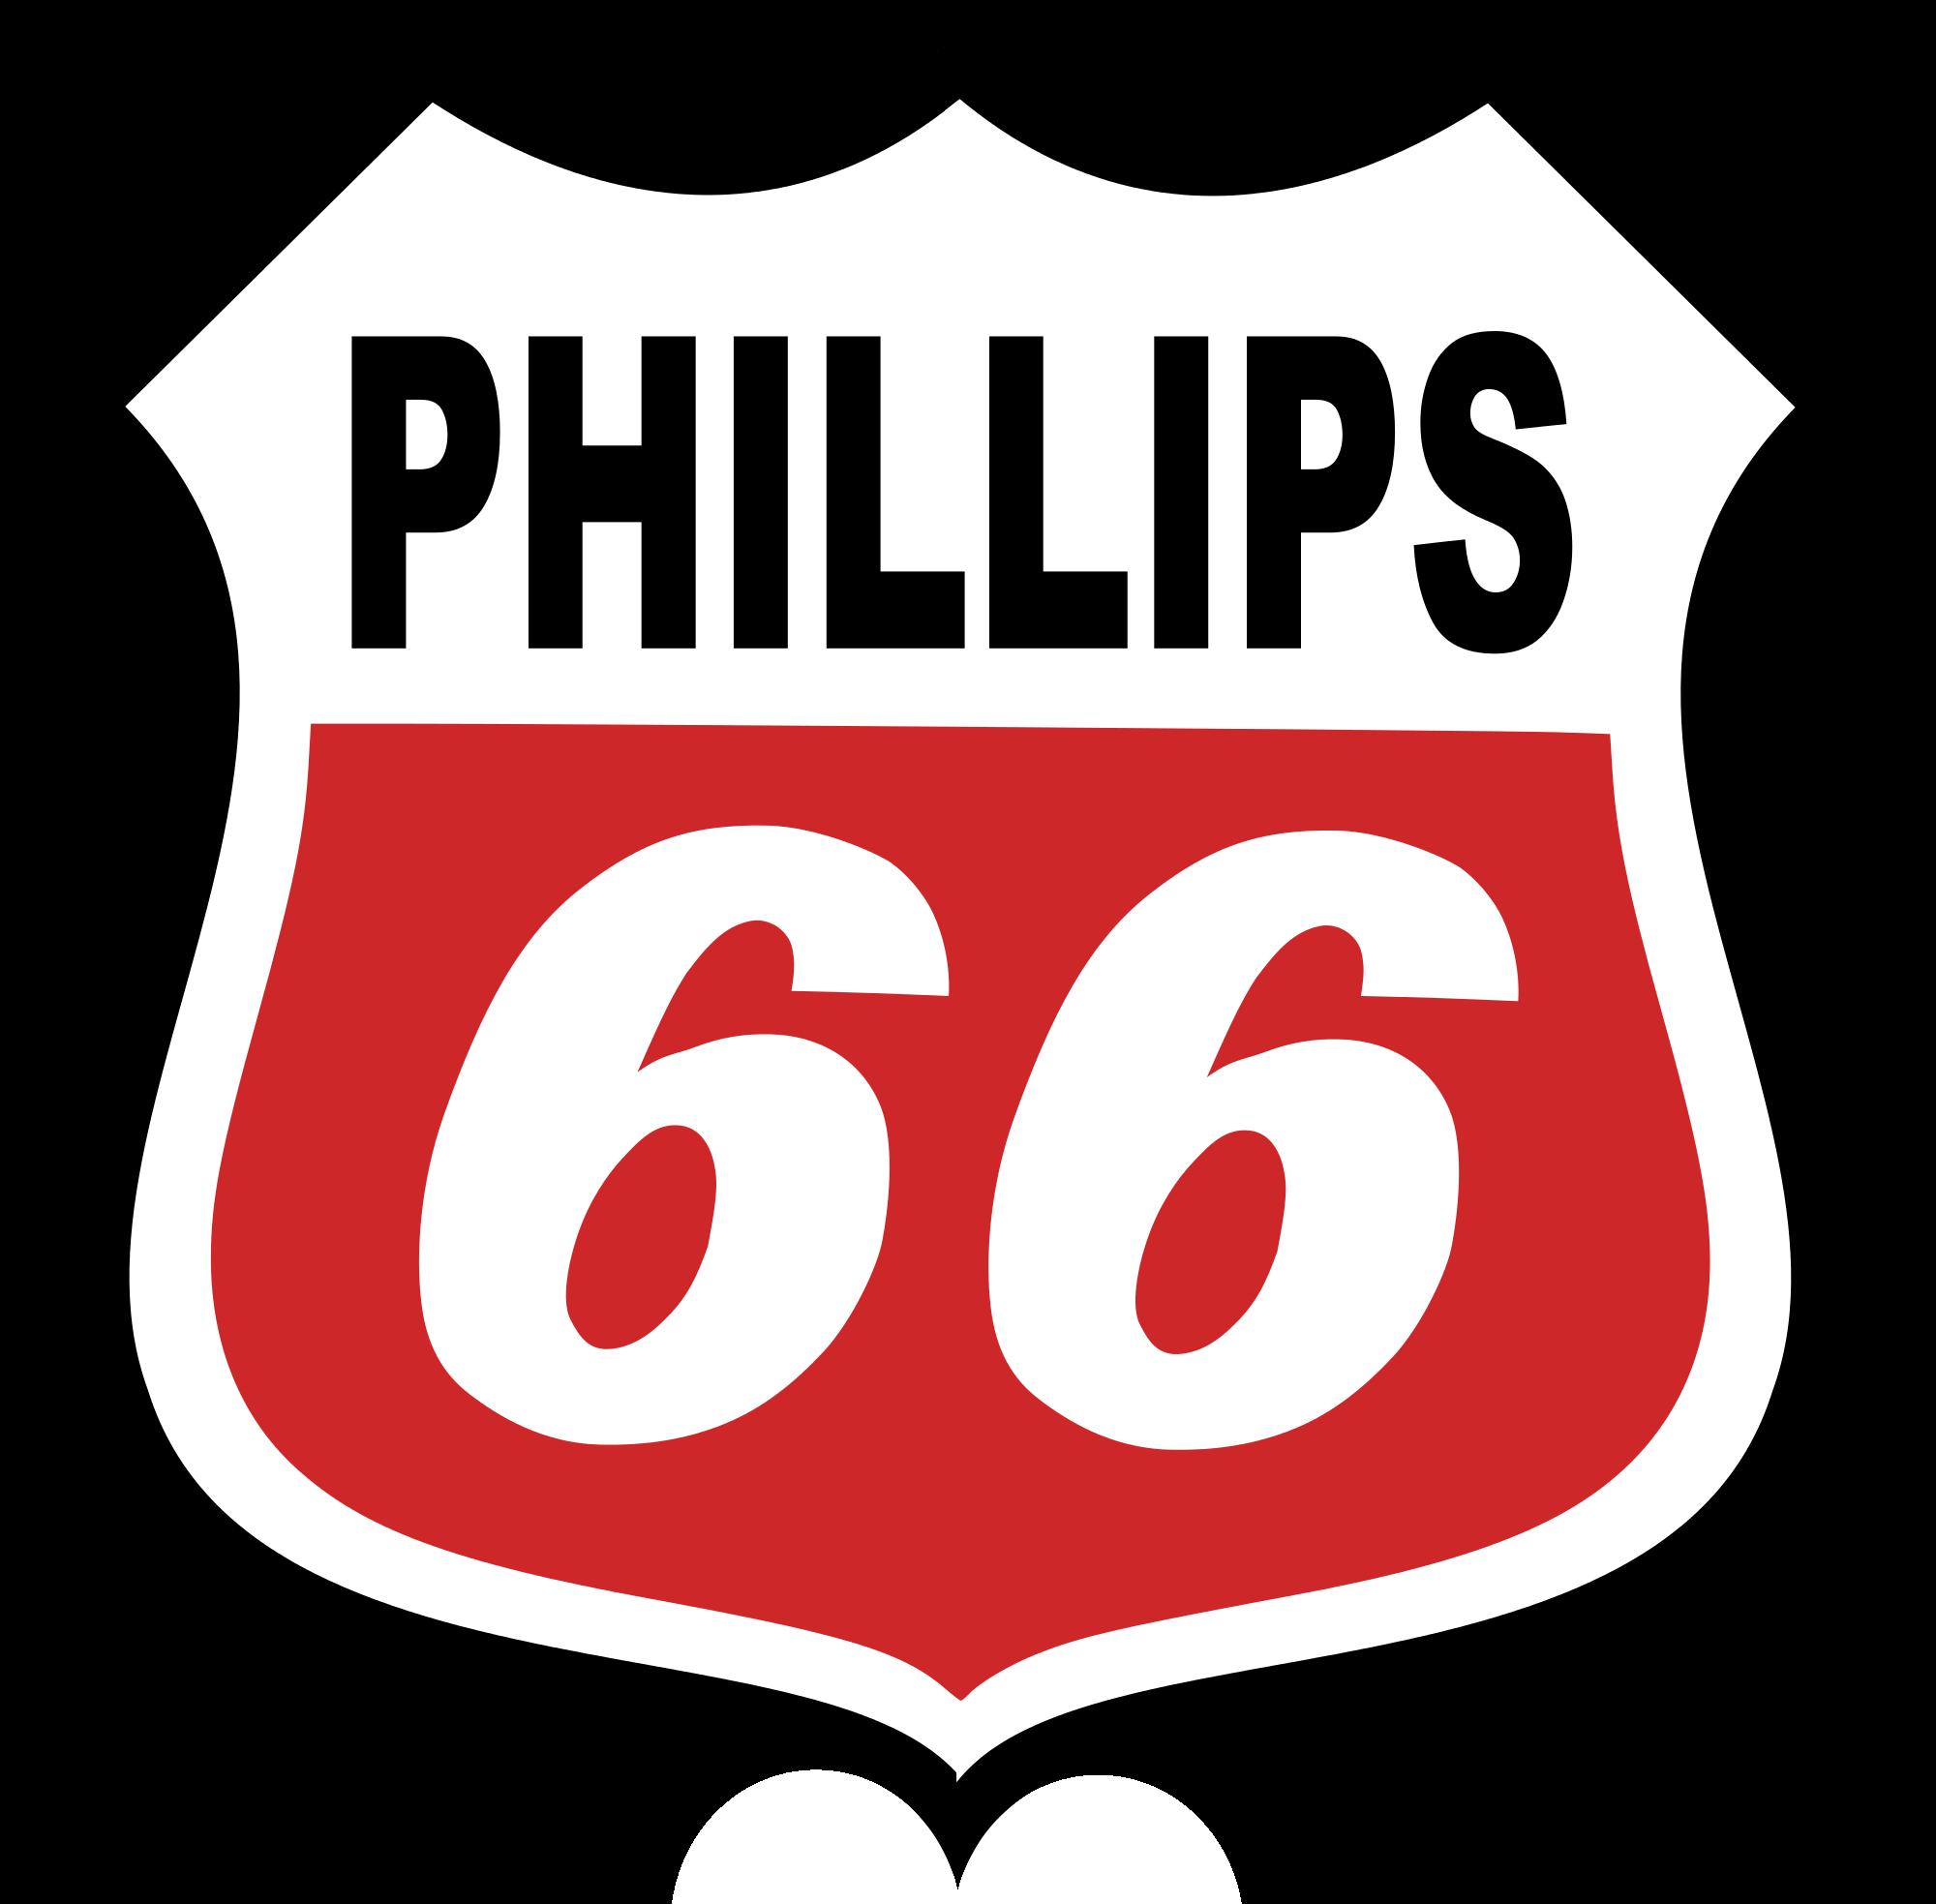 Phillips 66 Philgear Industrial Lube 100 Cross Ref